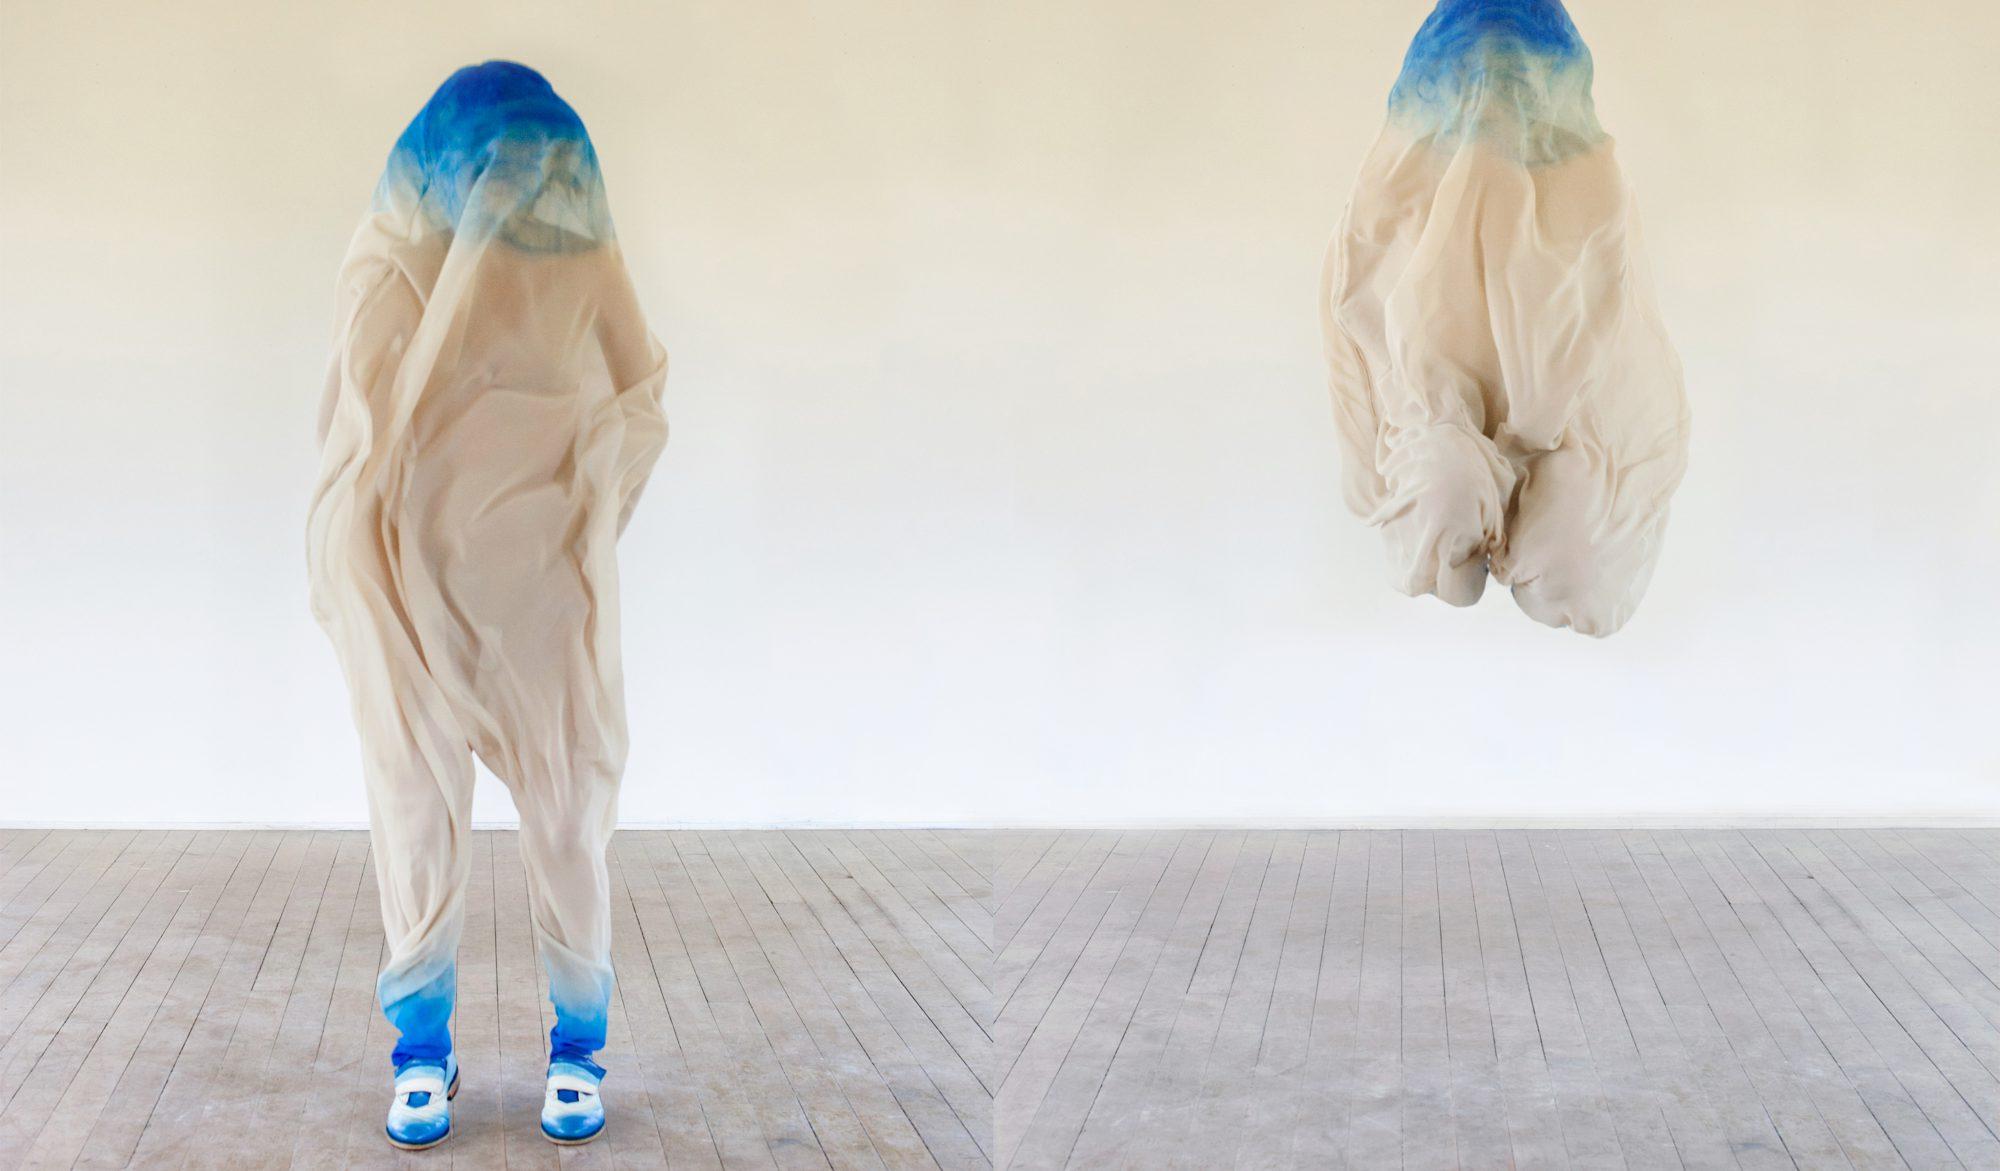 Ashley Eva Brock, Shoe Creature